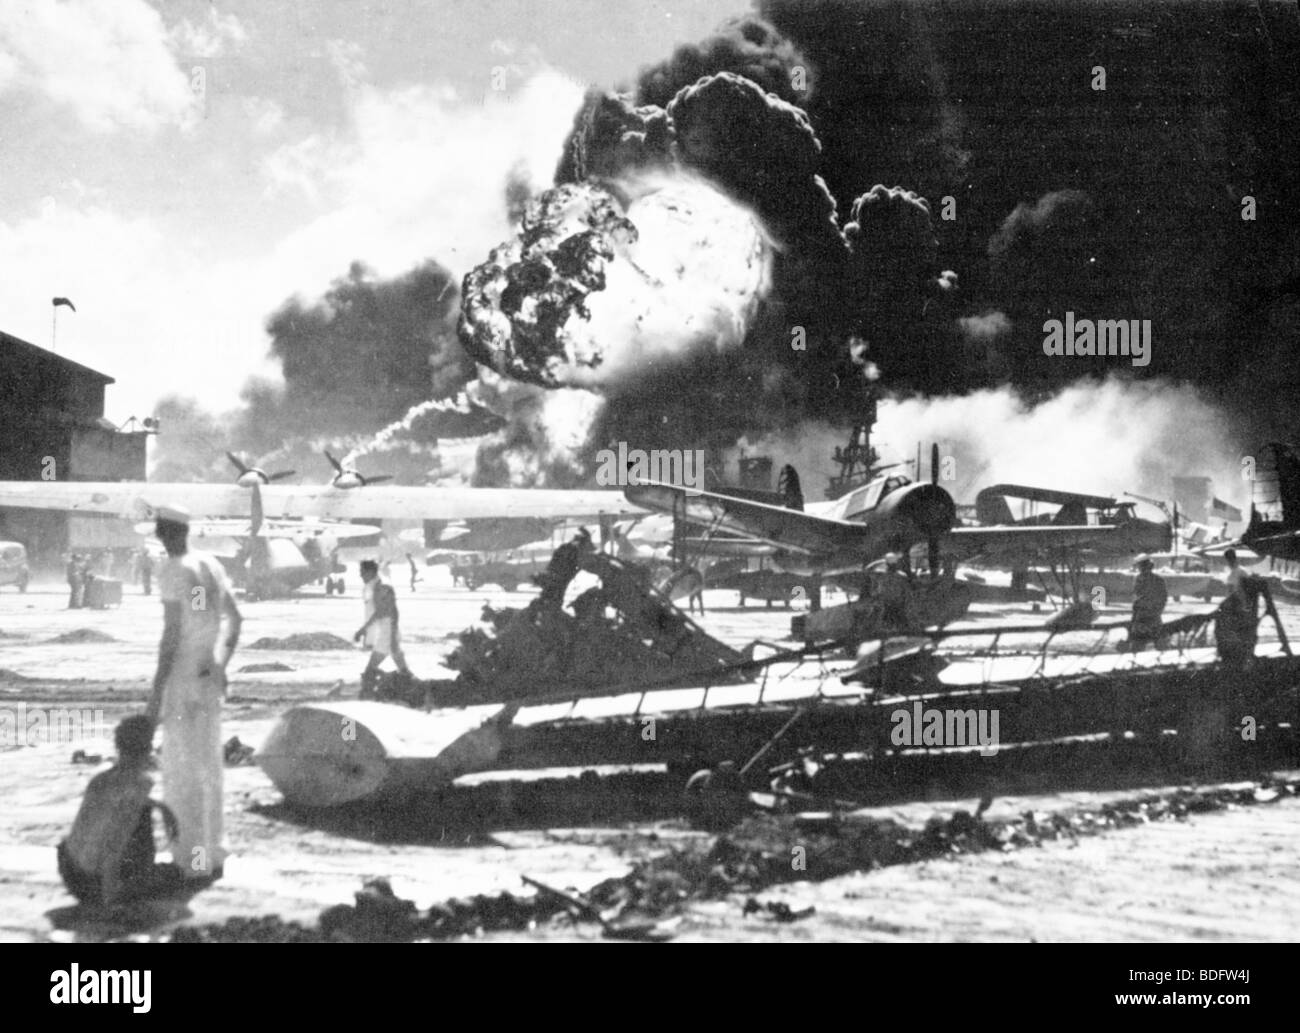 PEARL Harbor Angriff von Japan auf dem US-Stützpunkt in Oahu, Hawaii am 7. Dezember 1941 Stockbild